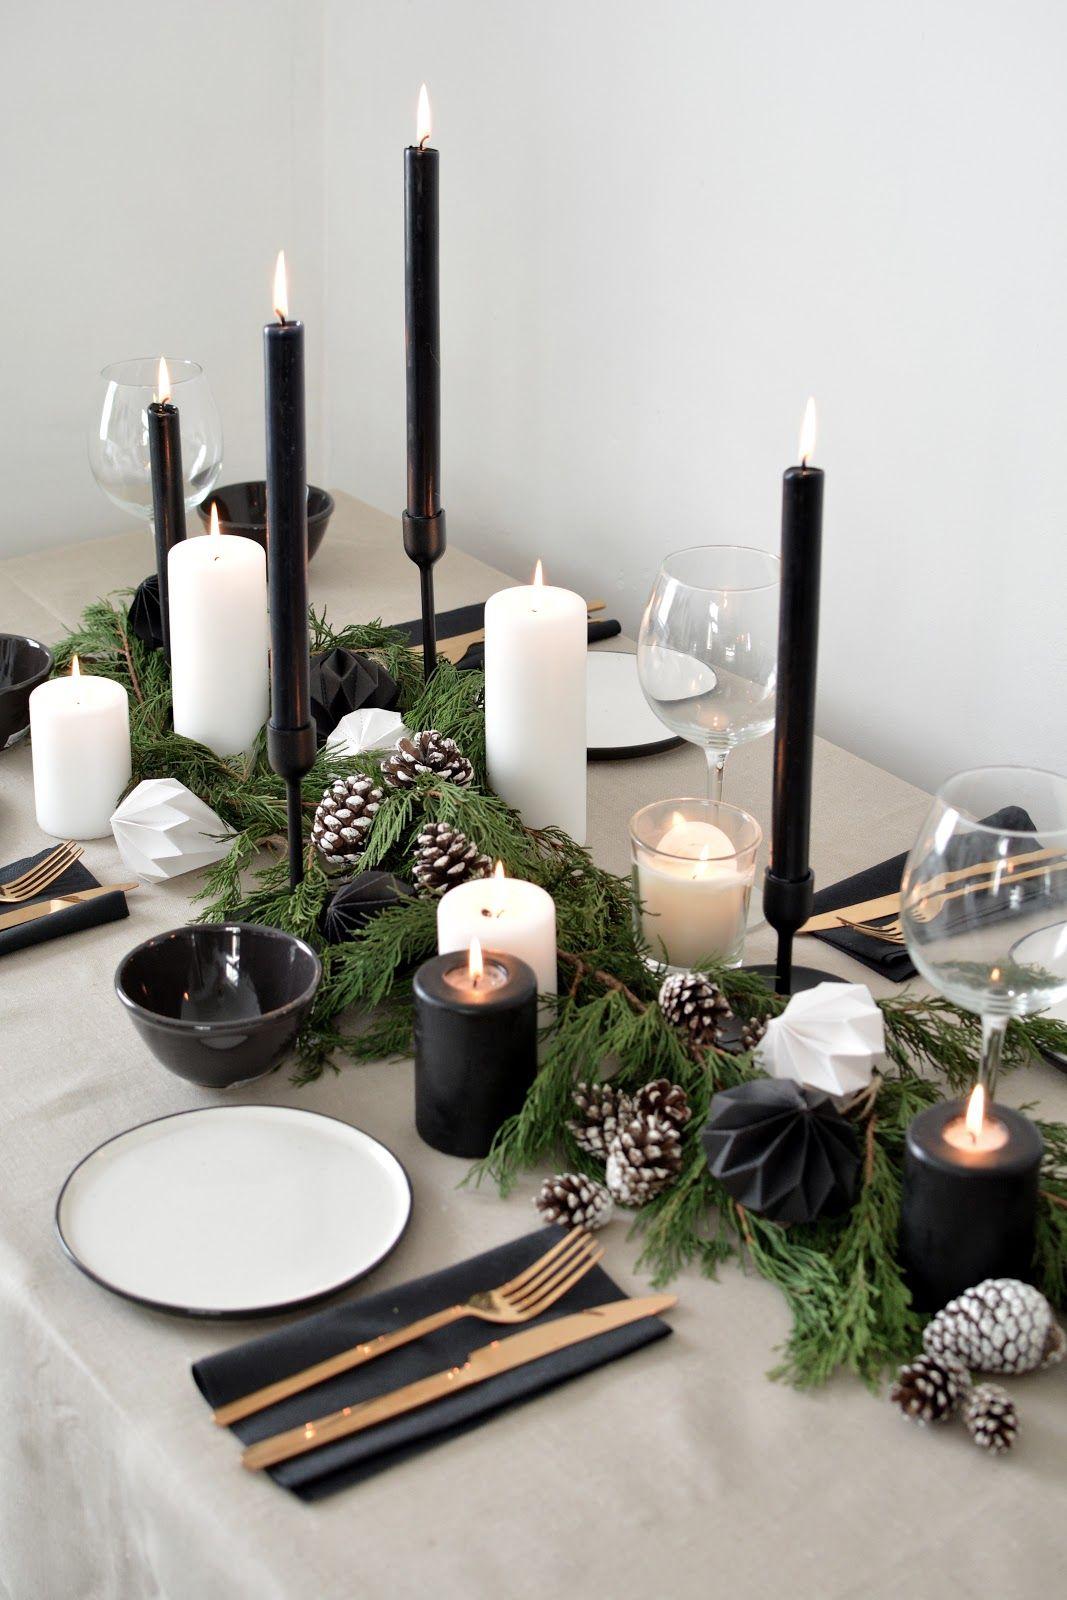 A Scandinavian Inspired Christmas Table Setting Holiday Table Decorations Scandinavian Christmas Decorations Christmas Table Centerpieces